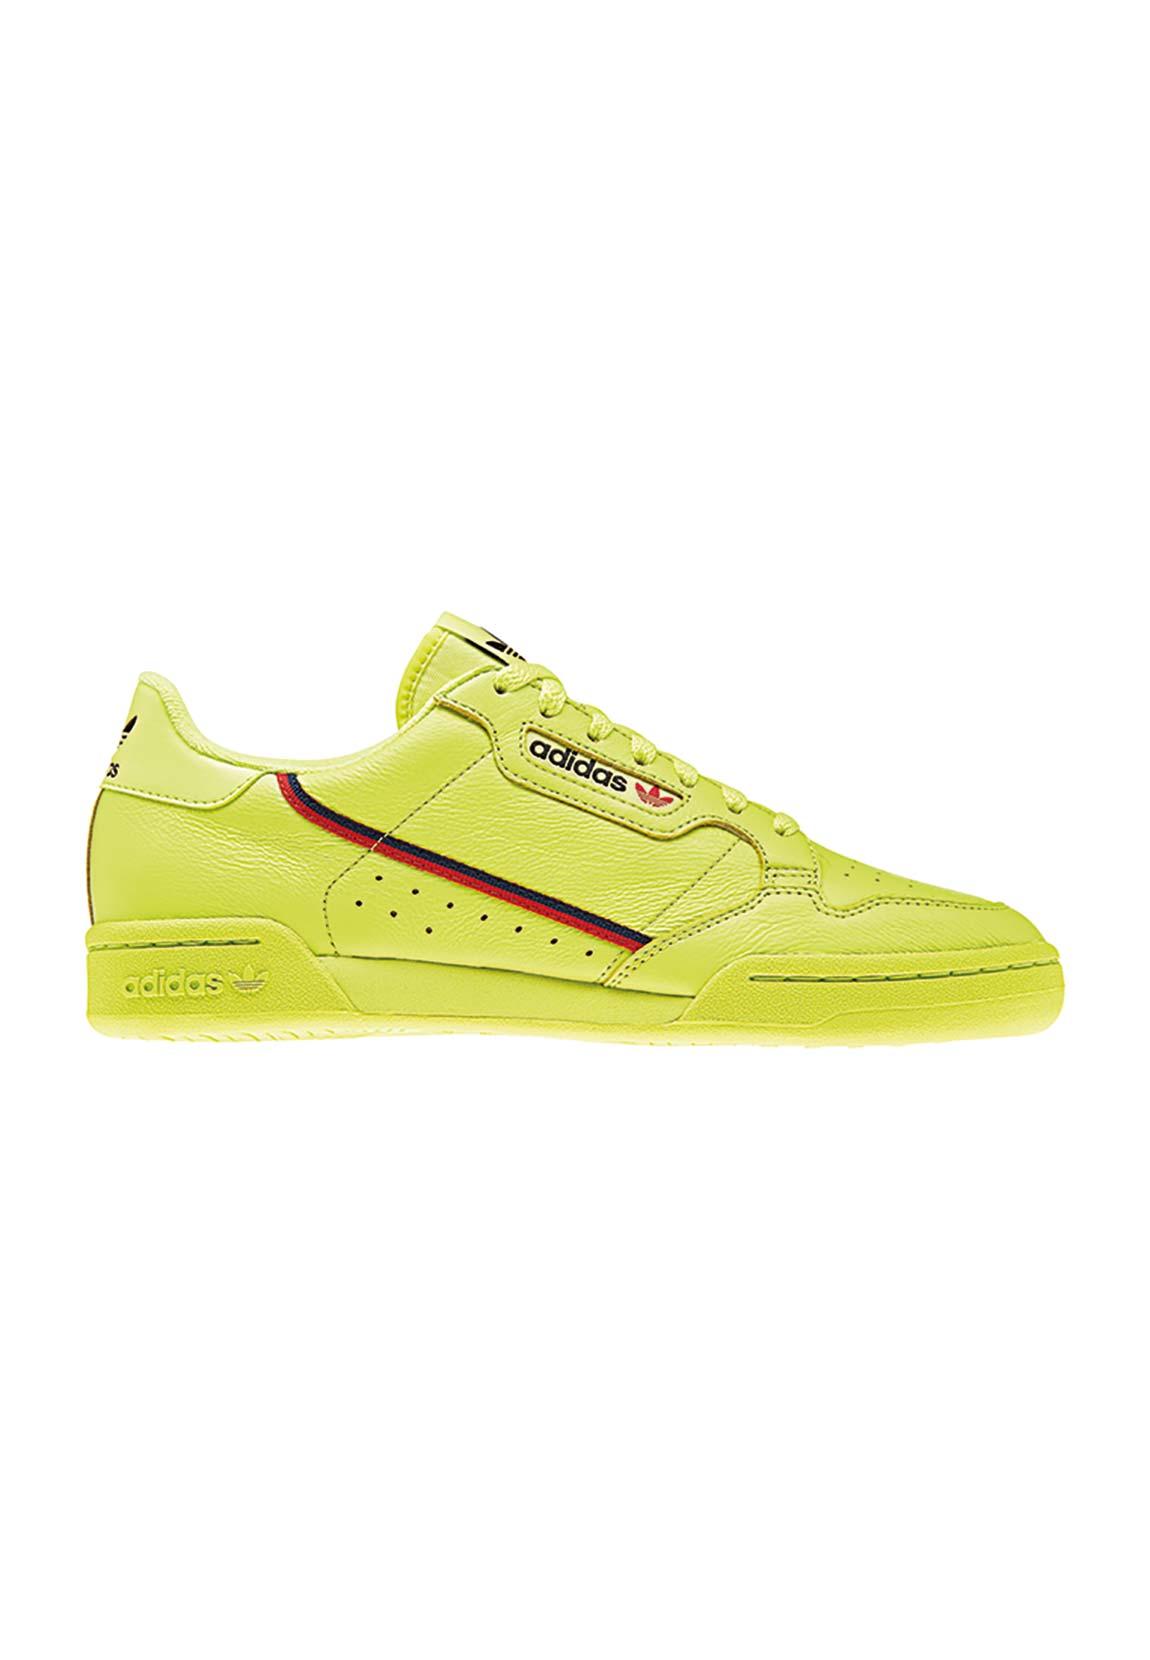 Adidas Originals Sneaker CONTINENTAL 80 B41675 Neongelb | eBay